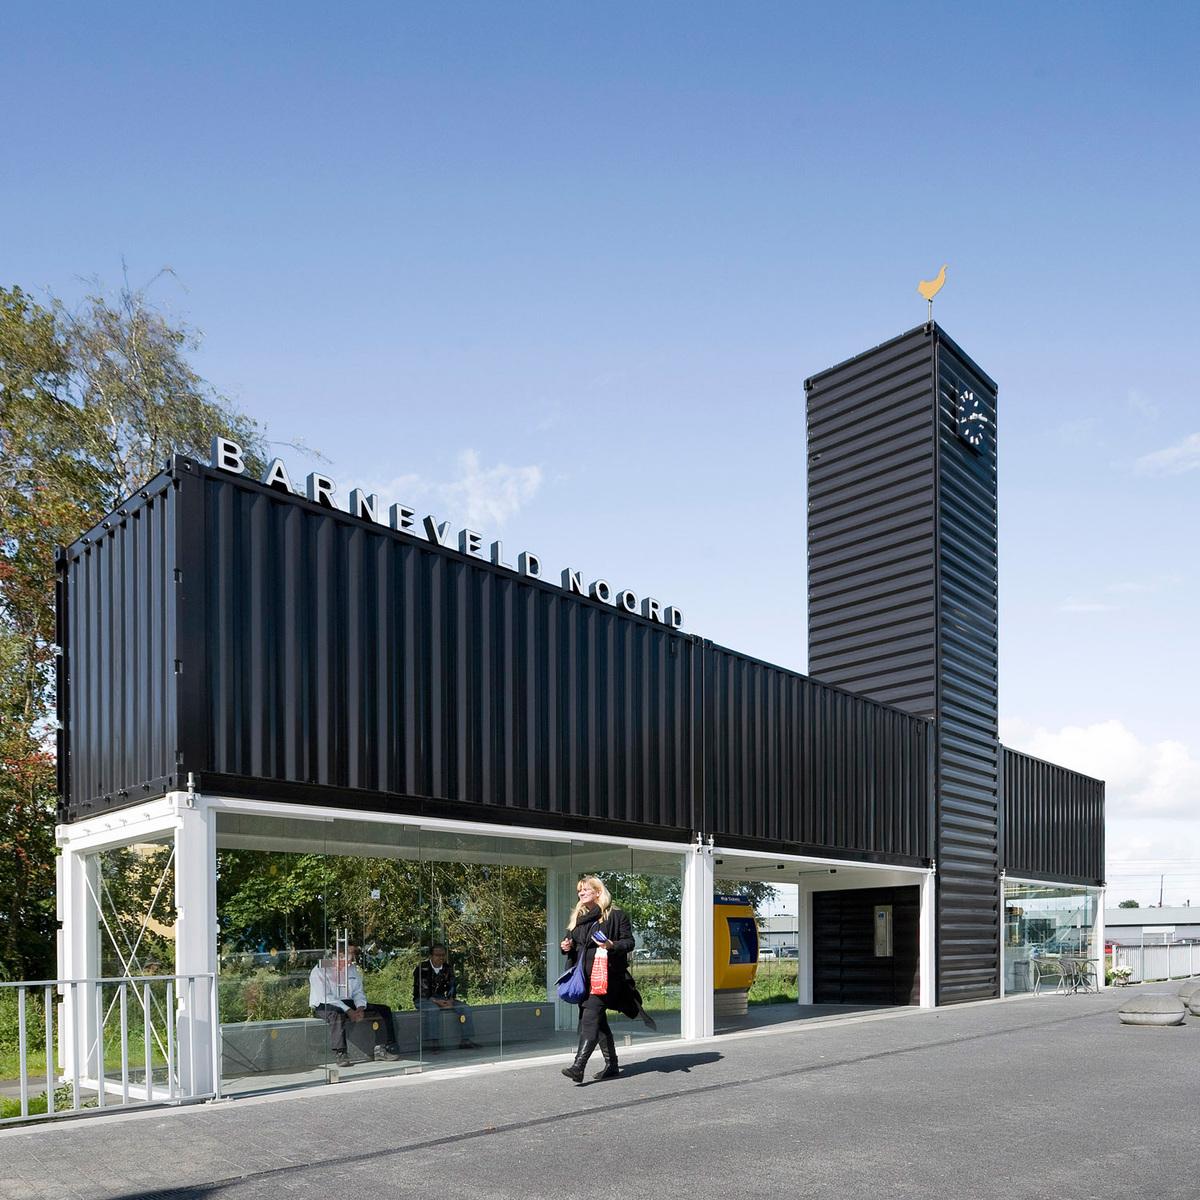 Barneveld Noord Station by NL Architects. Photo: Marcel van der Burg